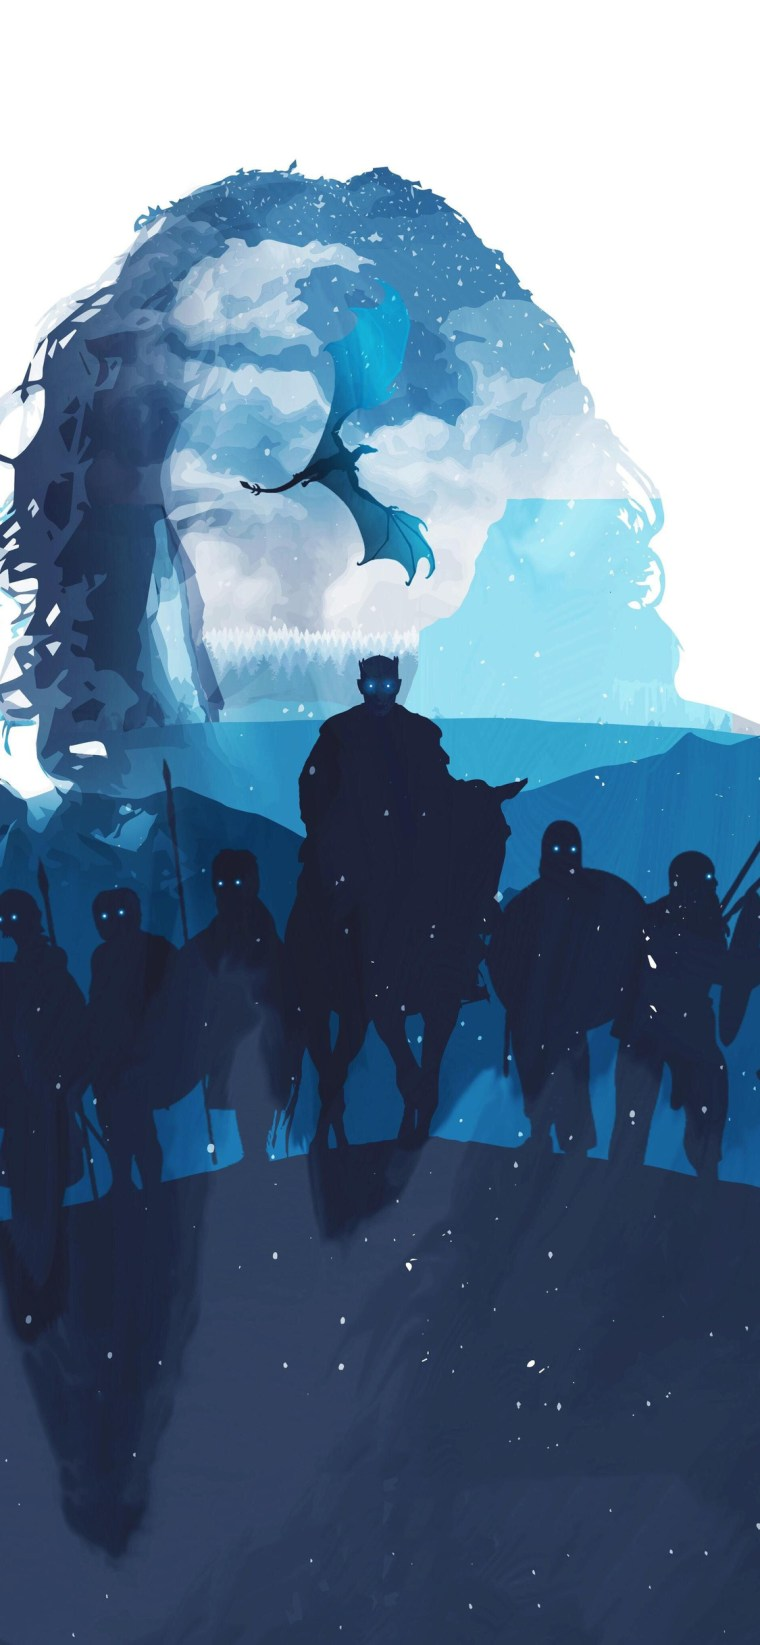 winter-is-here- iPhone game of thrones wallpaper